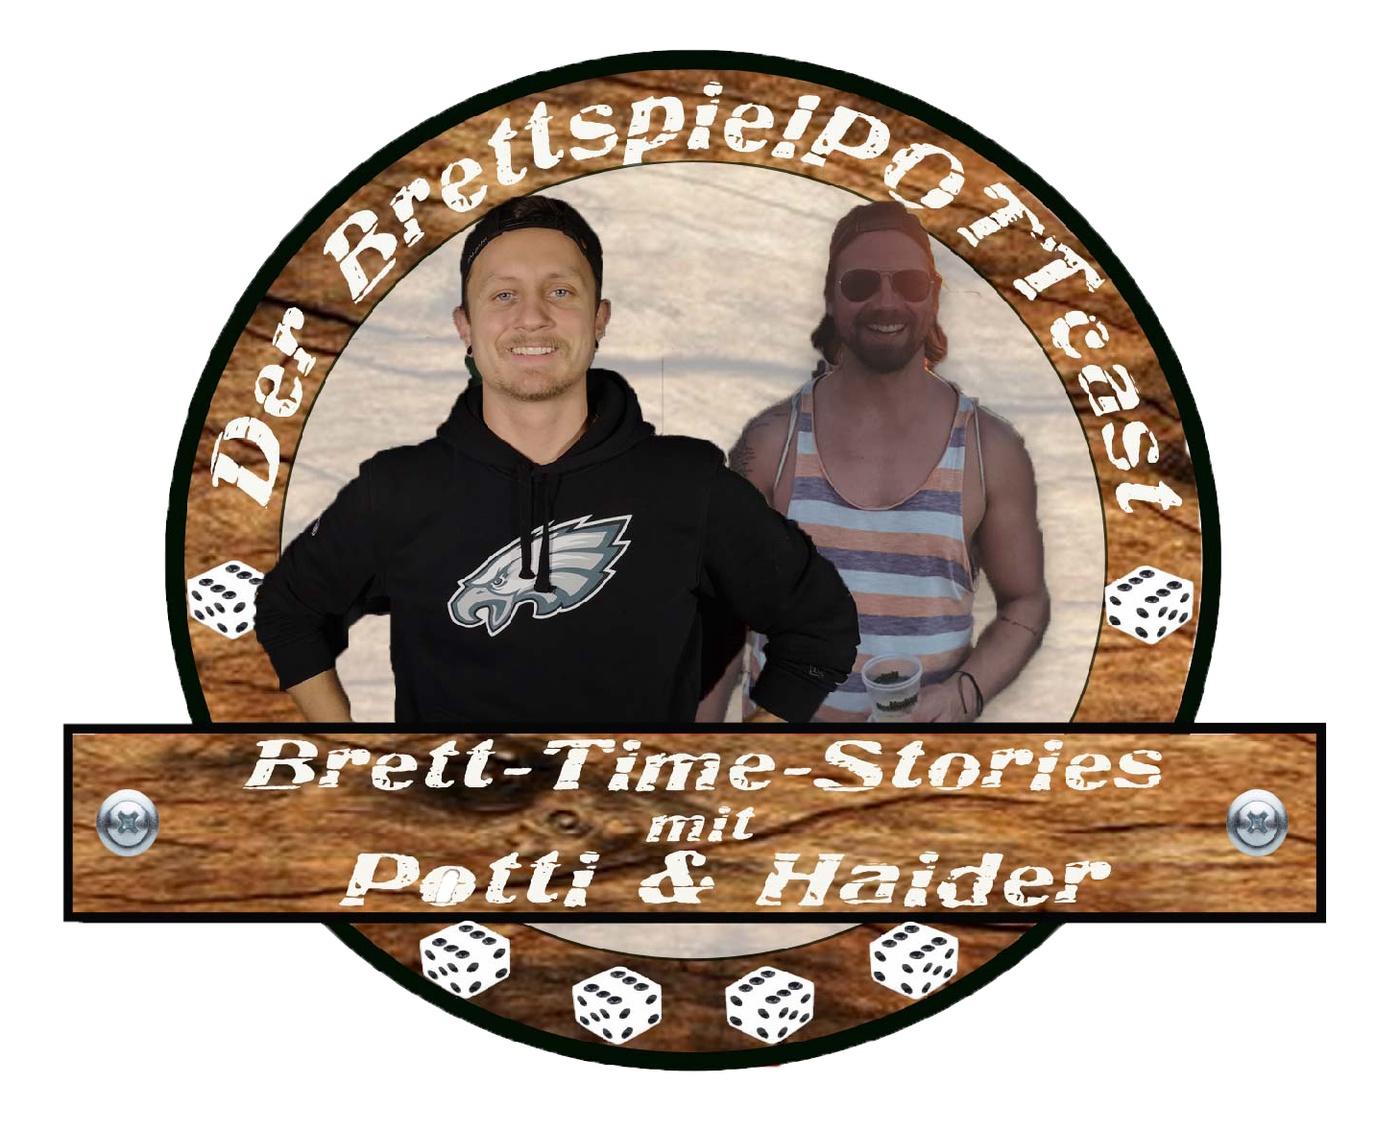 Brett-Time-Stories - Der Brettspiele POTTcast